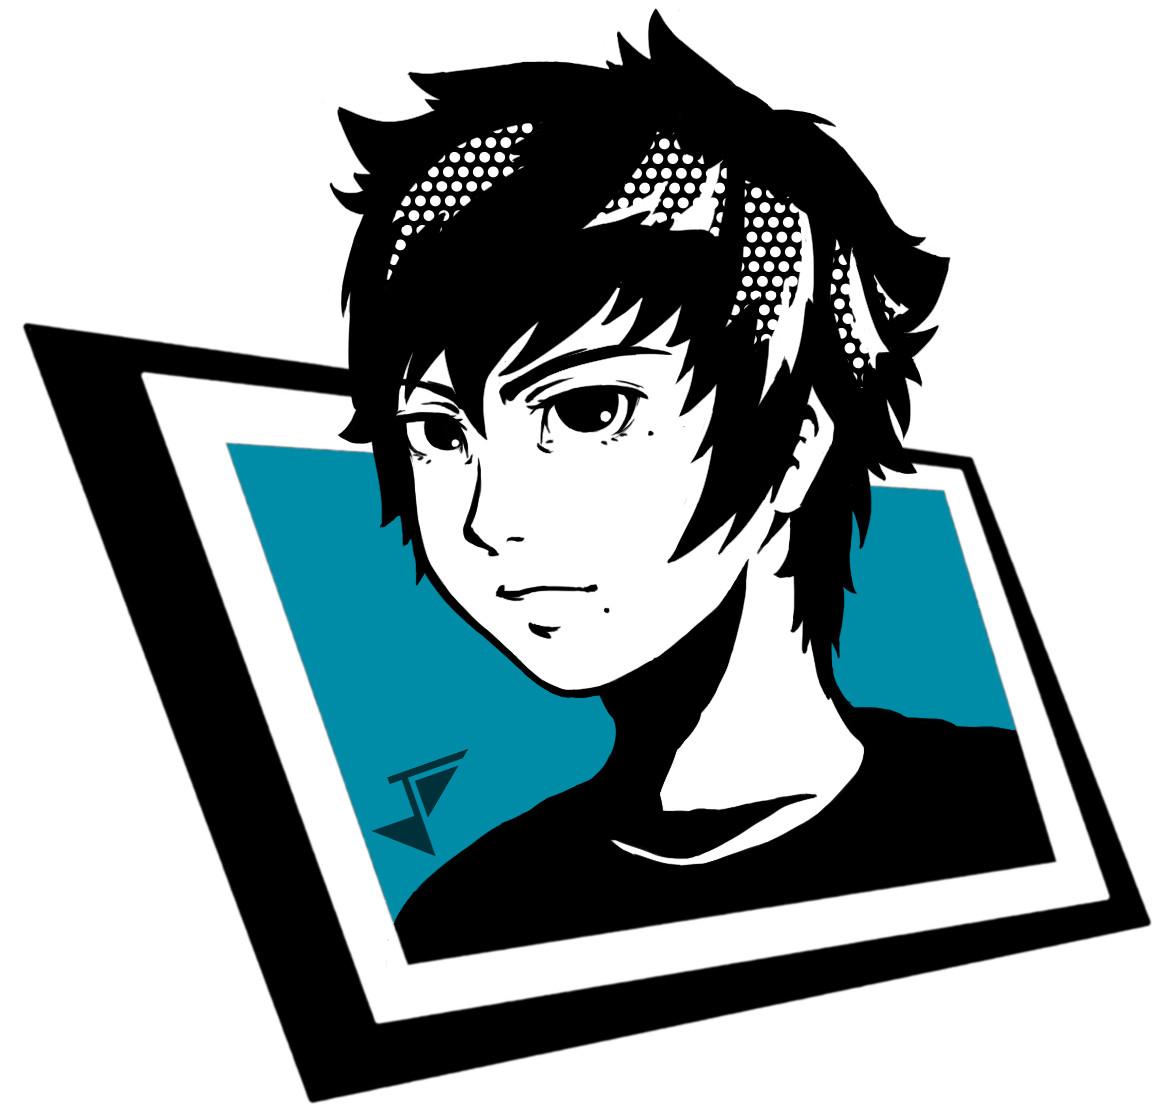 ArtStation - Persona 5 SNS / IM Avatar Commissions, Ian Matining